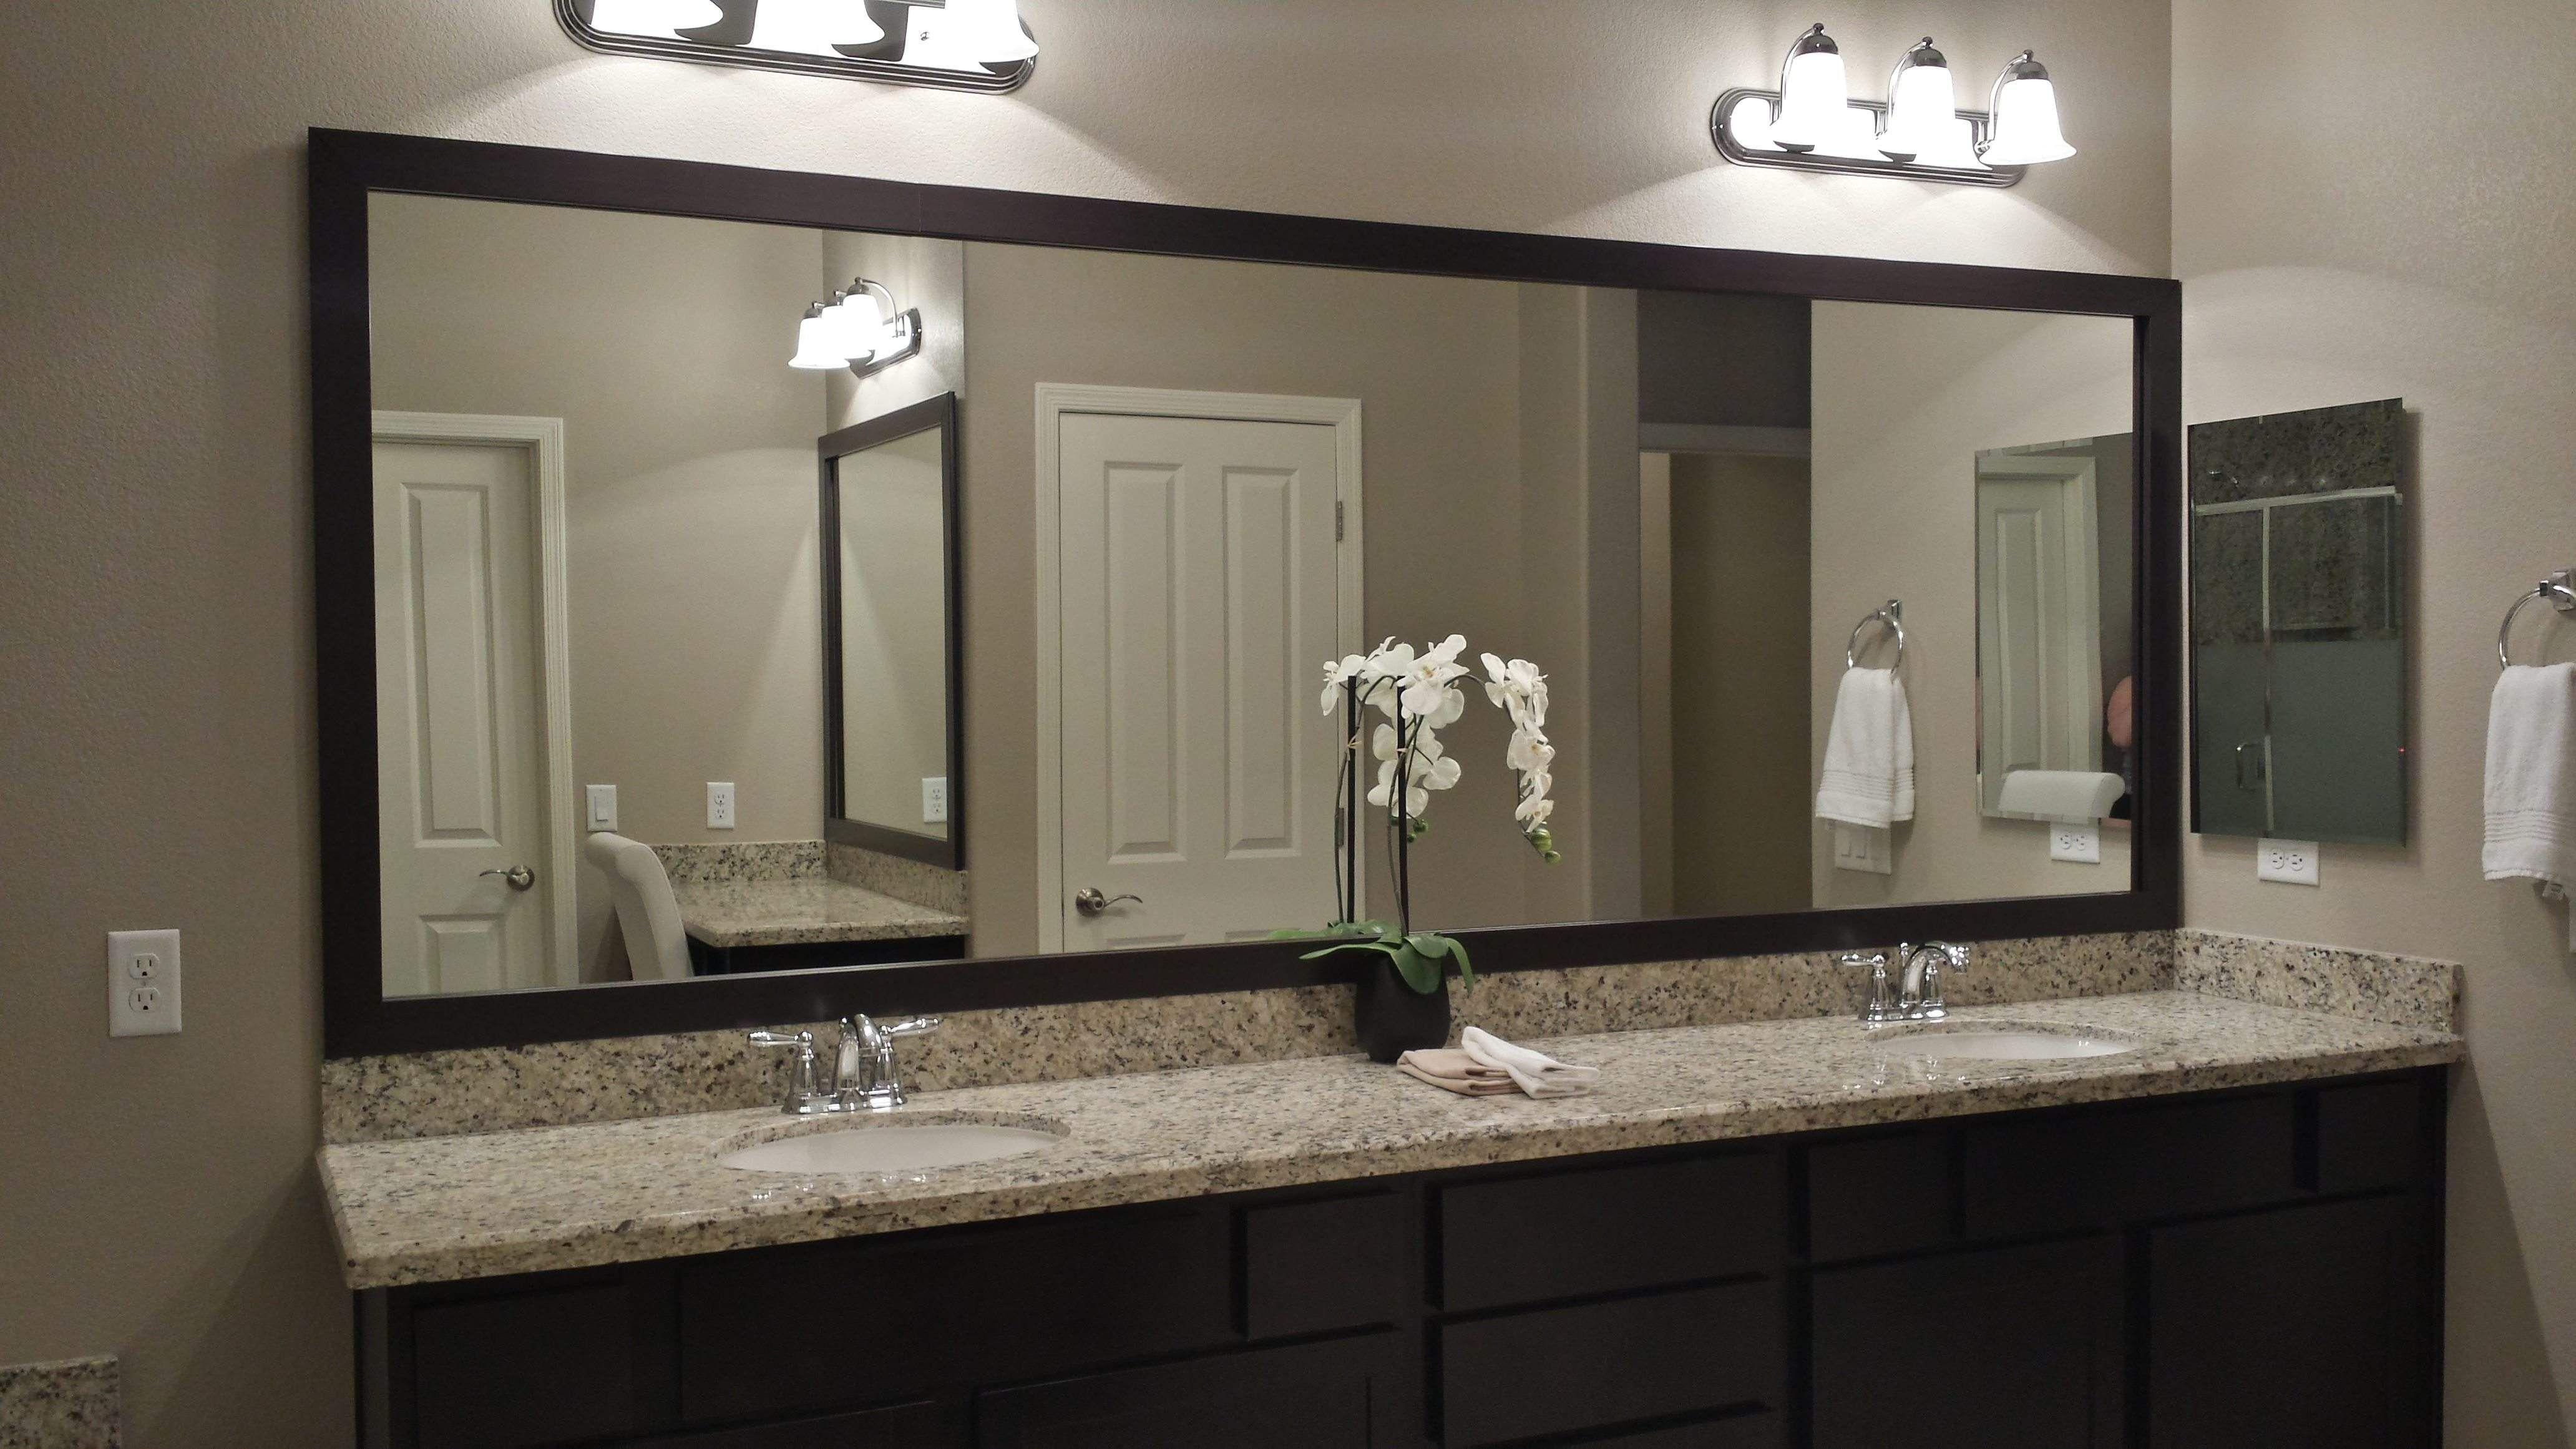 Bathroom Vanity Mirror Exclusive Before And After Customer Bathroom Bathroom Mirrors Diy Bathroom Mirror Bathroom Mirror Makeover